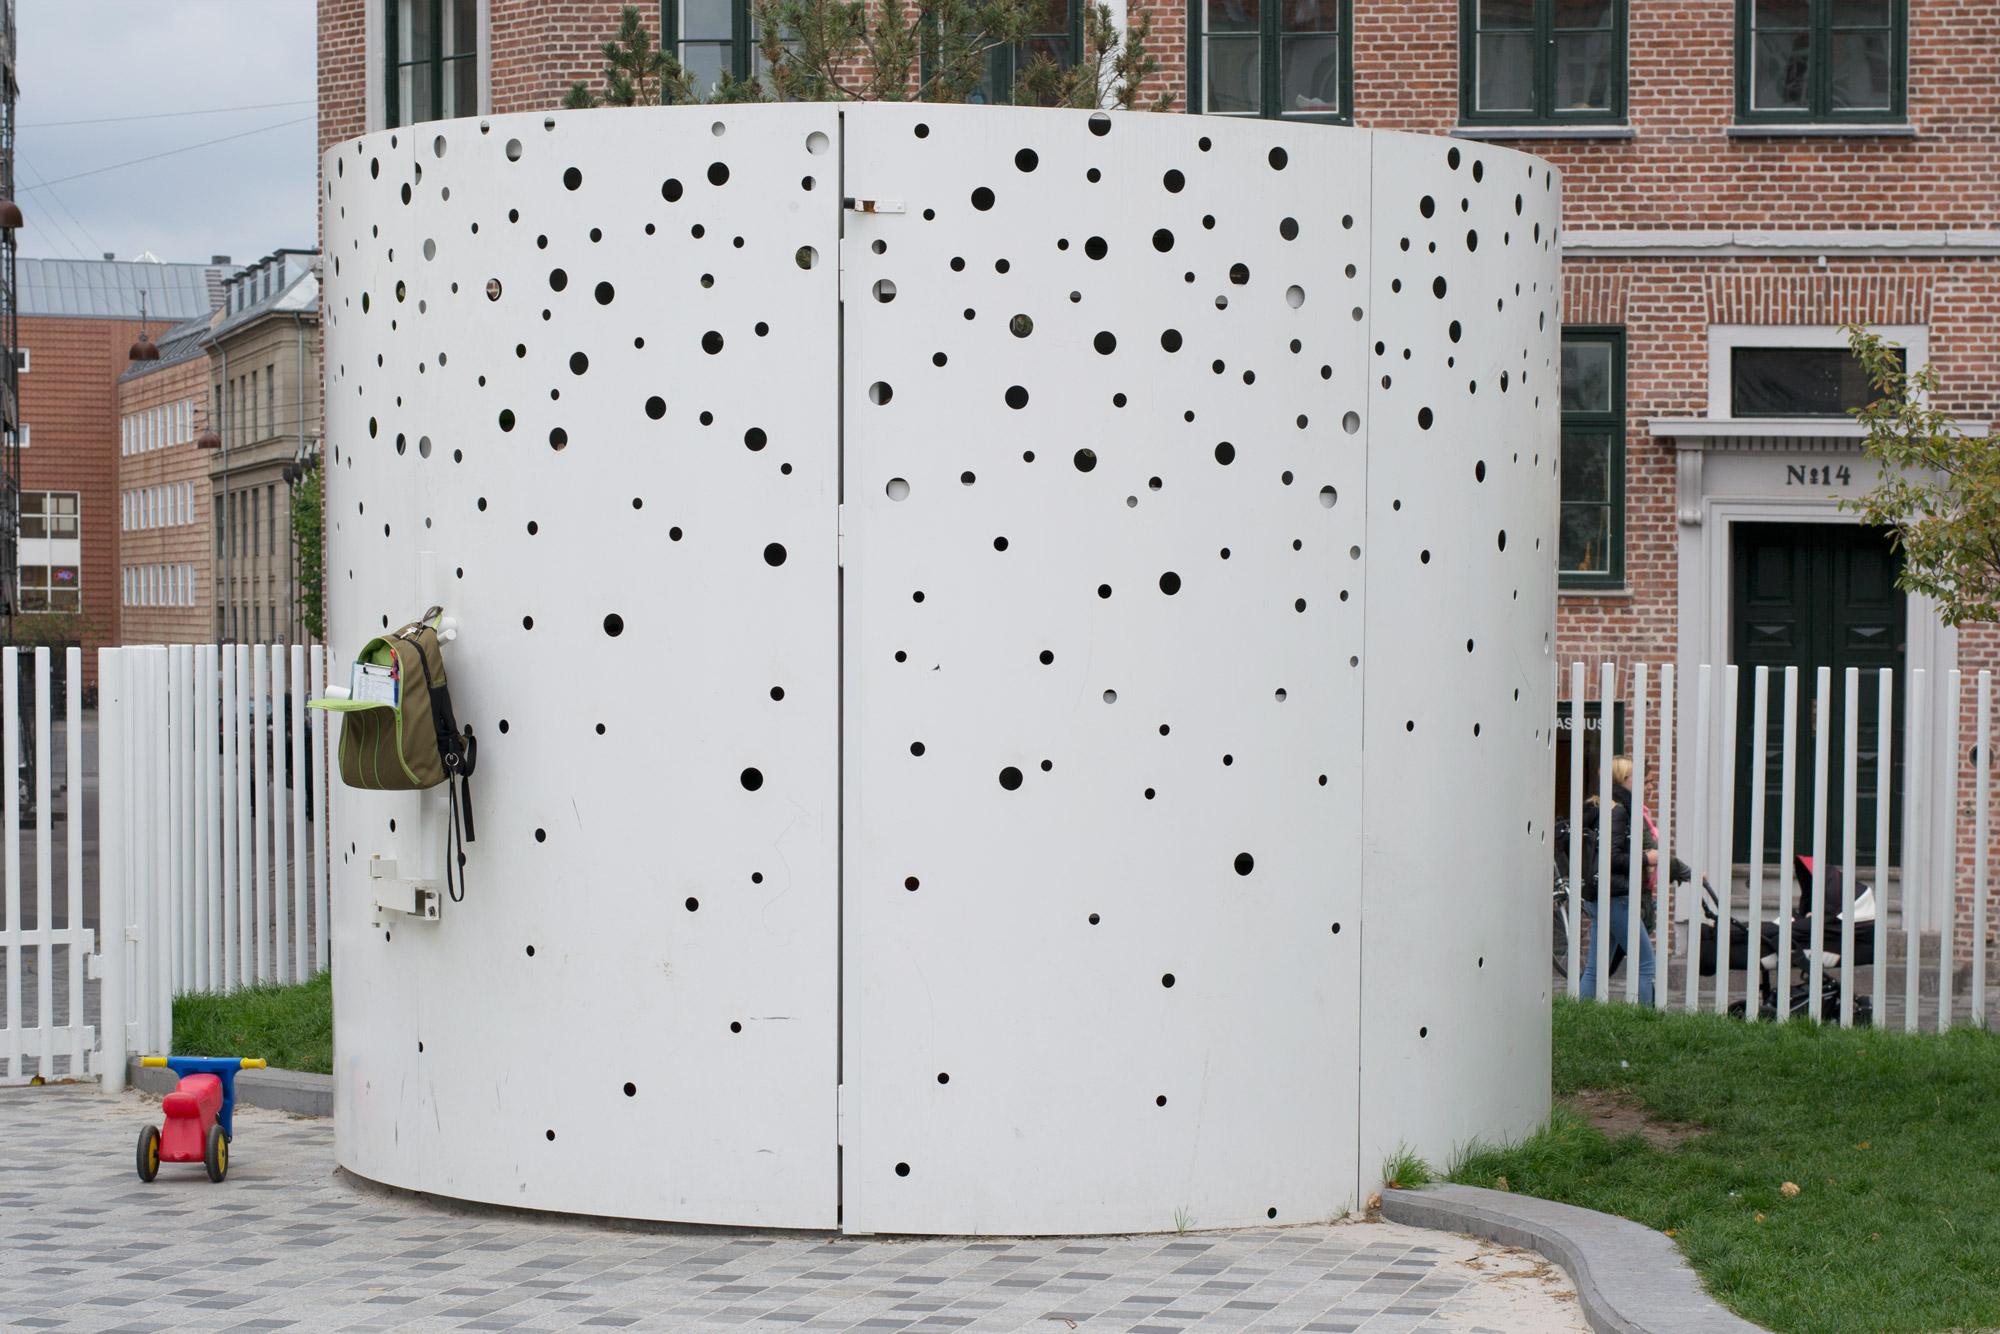 urbanbacklog-copenhagen-hauser-plads-2.jpg